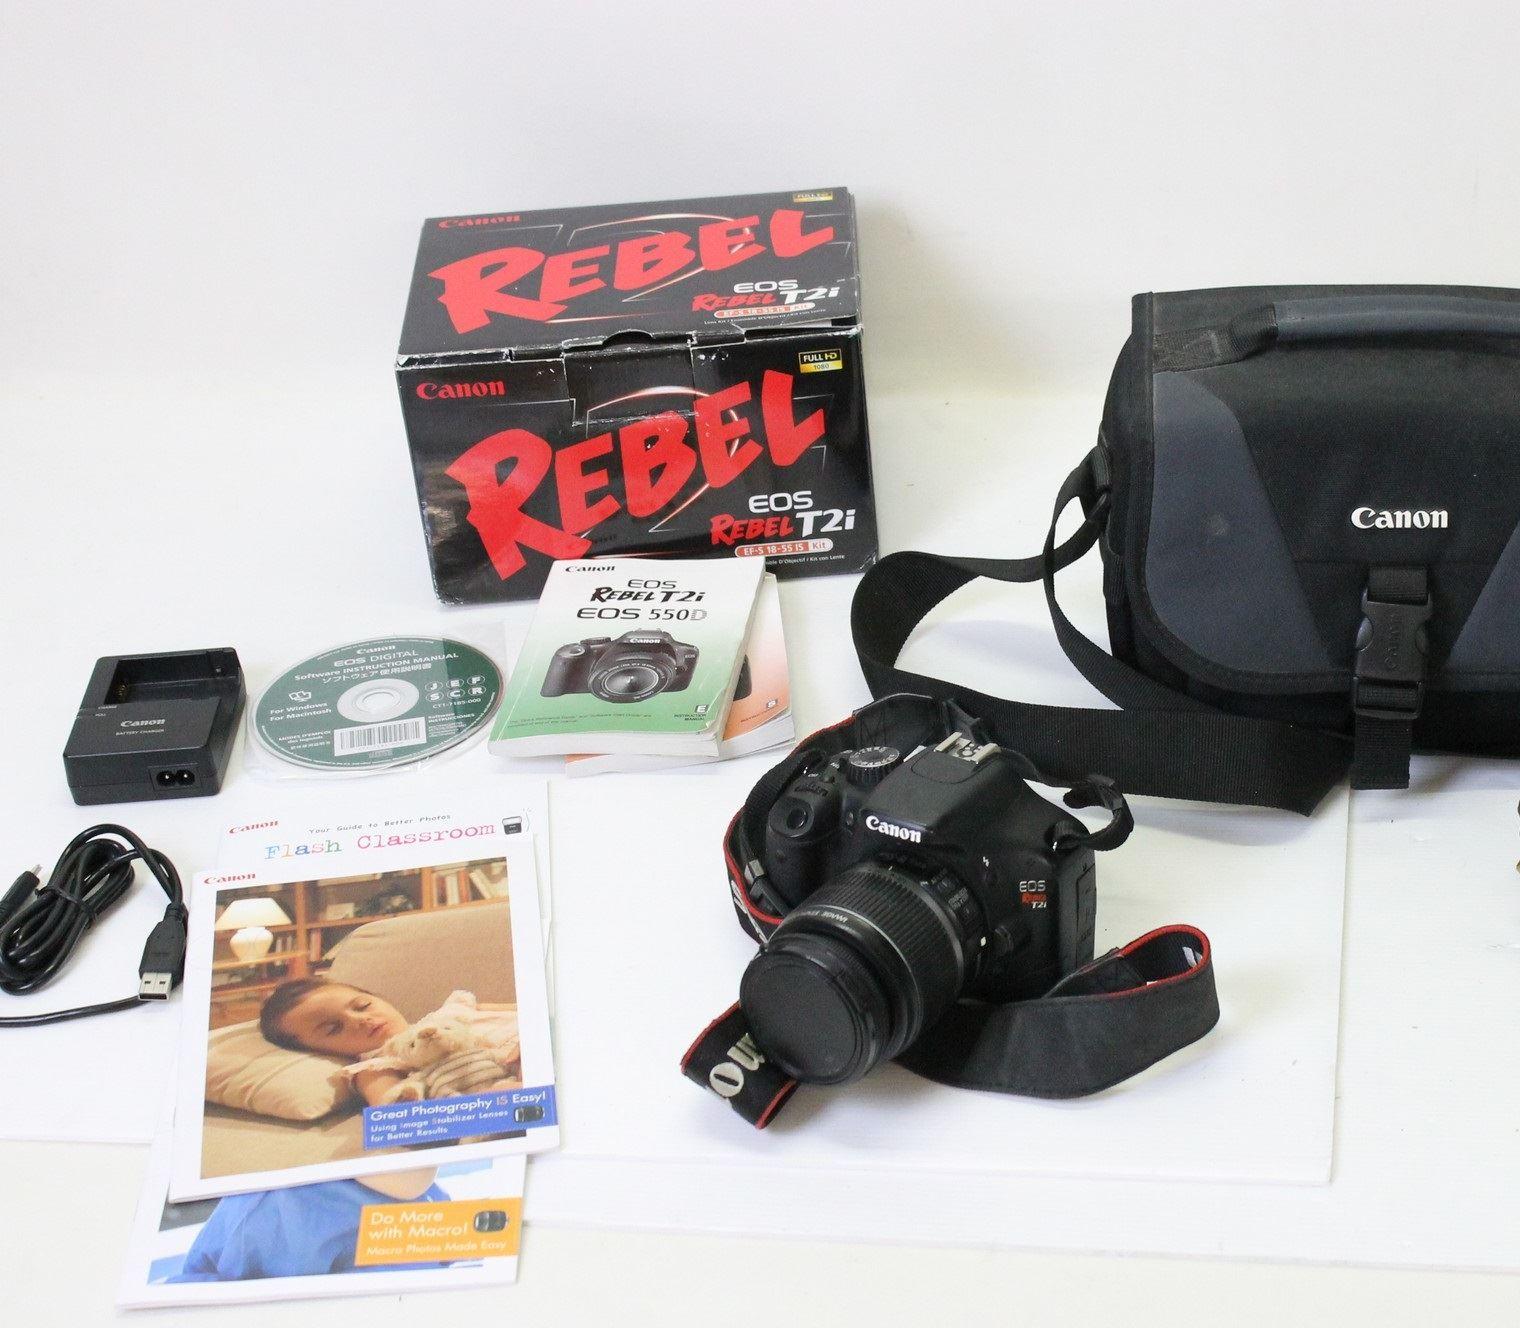 CANON EOS Rebel T2i (EOS 550D) Digital SLR Camera Zoom Lens EF-S 18-55MM & Case